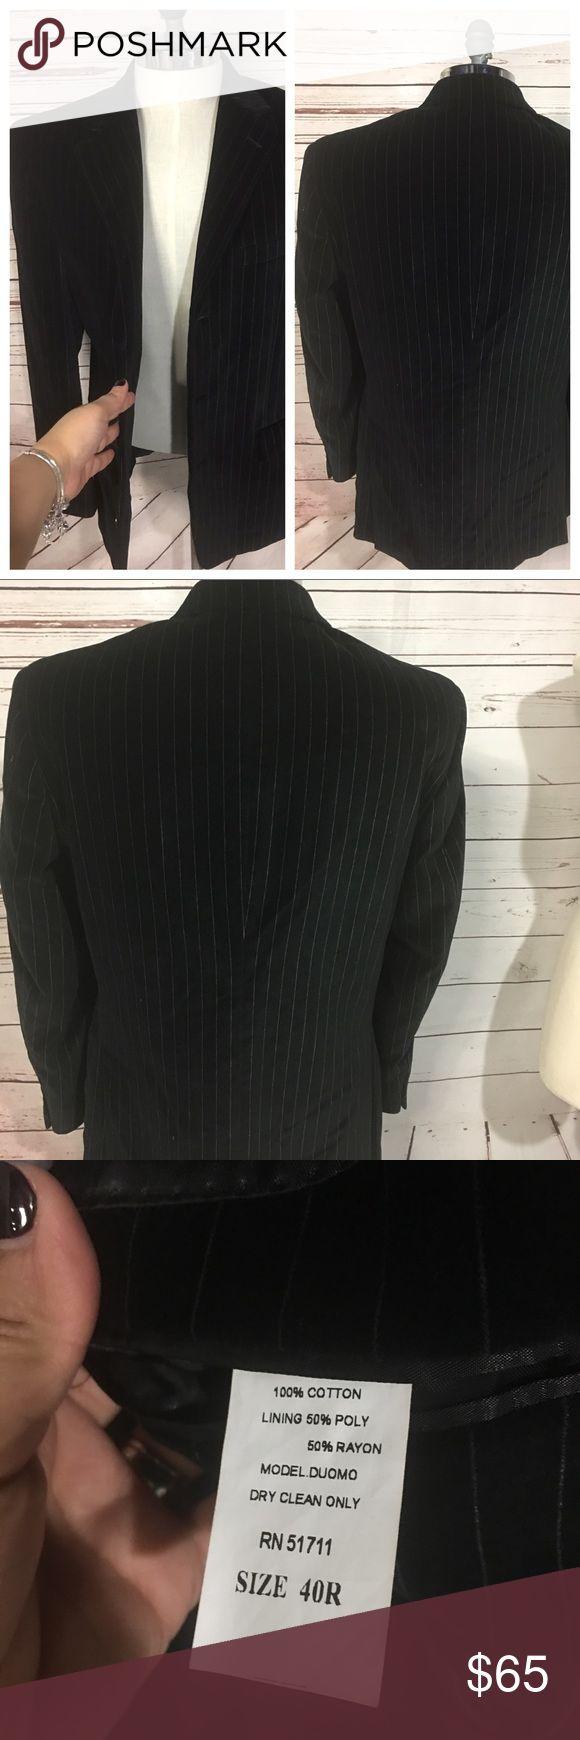 ANDREW FEZZA VELVET SUIT BLAZER SPORT JACKET 40R ANDREW FEZZA MEN BLACK CRUSH VELVET LOOK SUIT BLAZER SPORT COAT JACKET 40R Andrew Fezza Suits & Blazers Sport Coats & Blazers